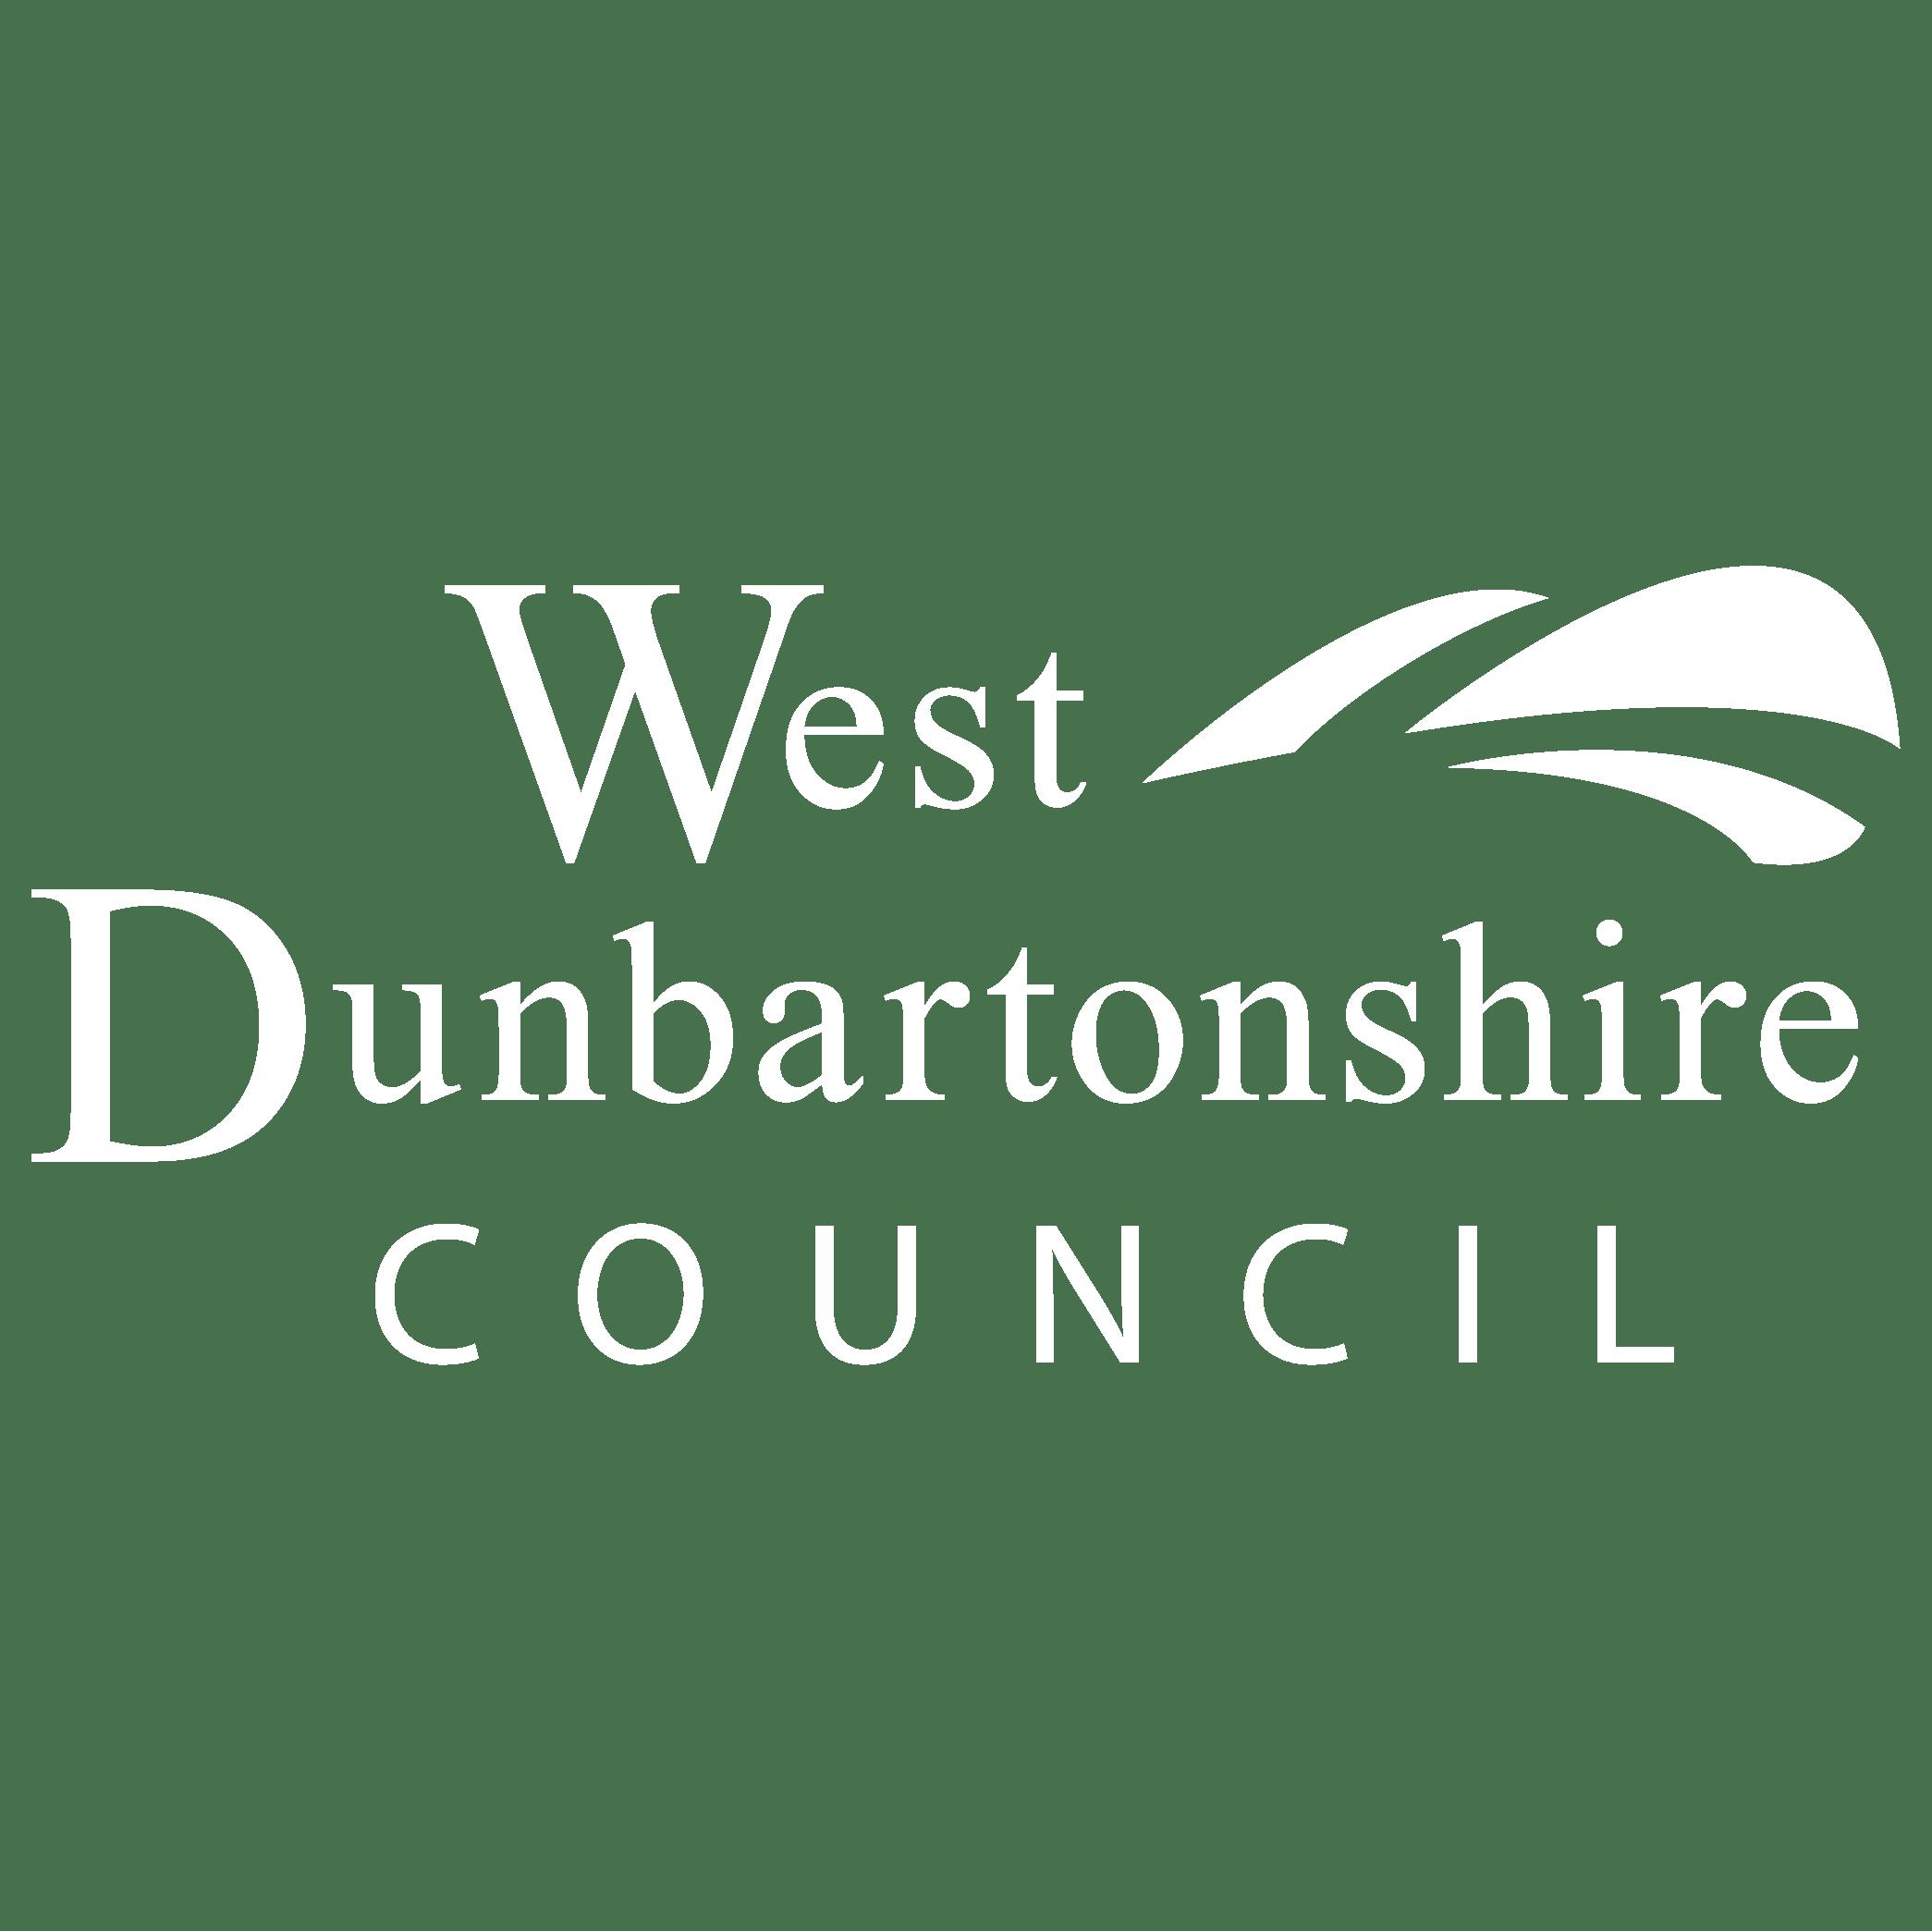 west-dunbartonshire-council-logo